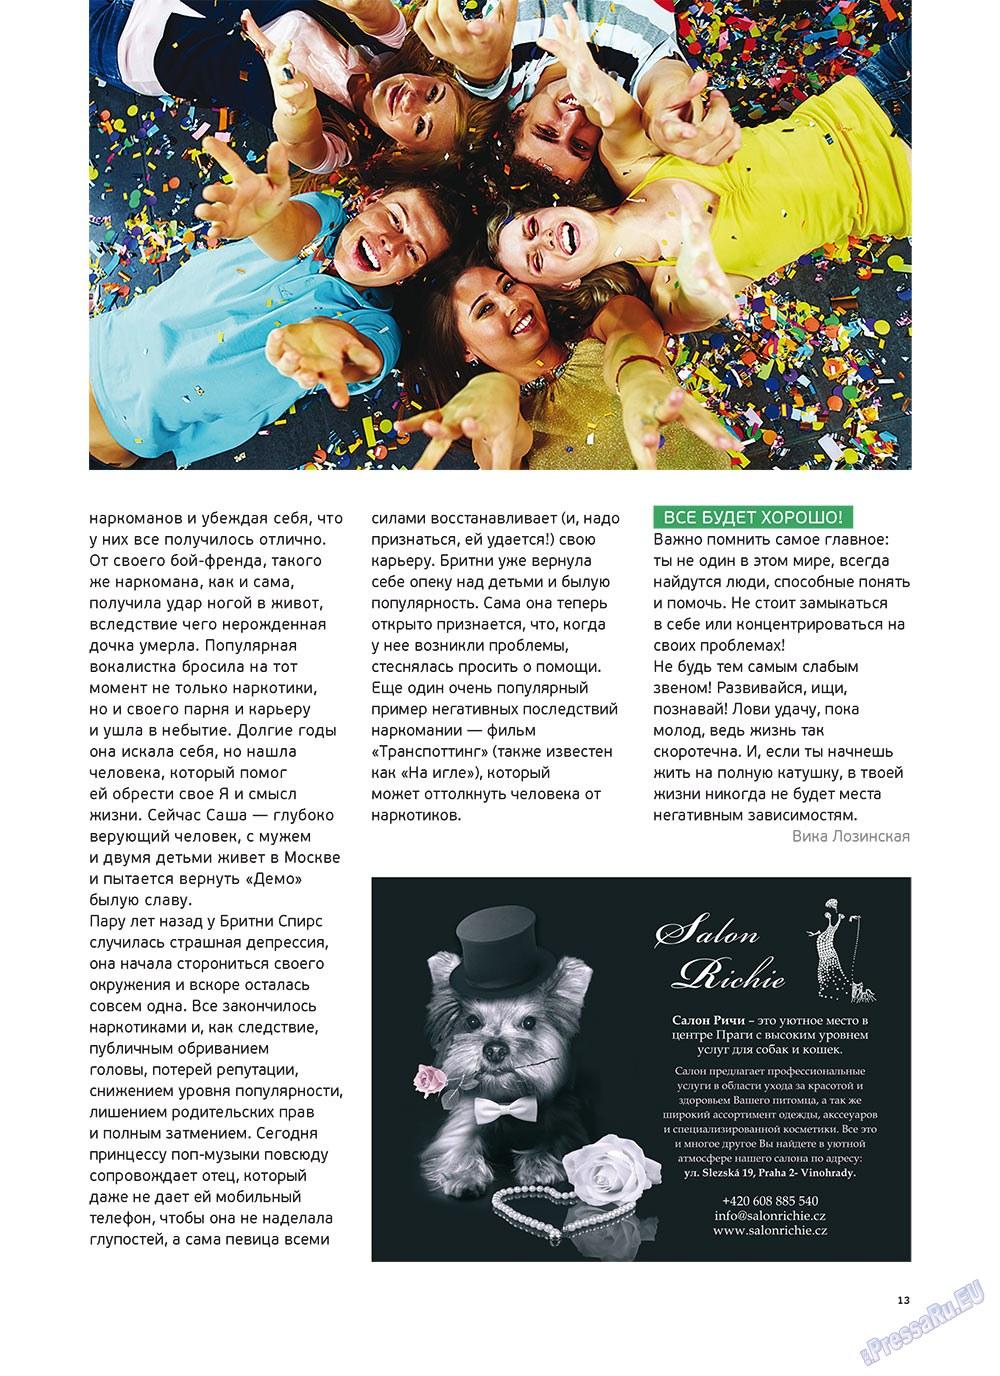 Артек (журнал). 2011 год, номер 4, стр. 15